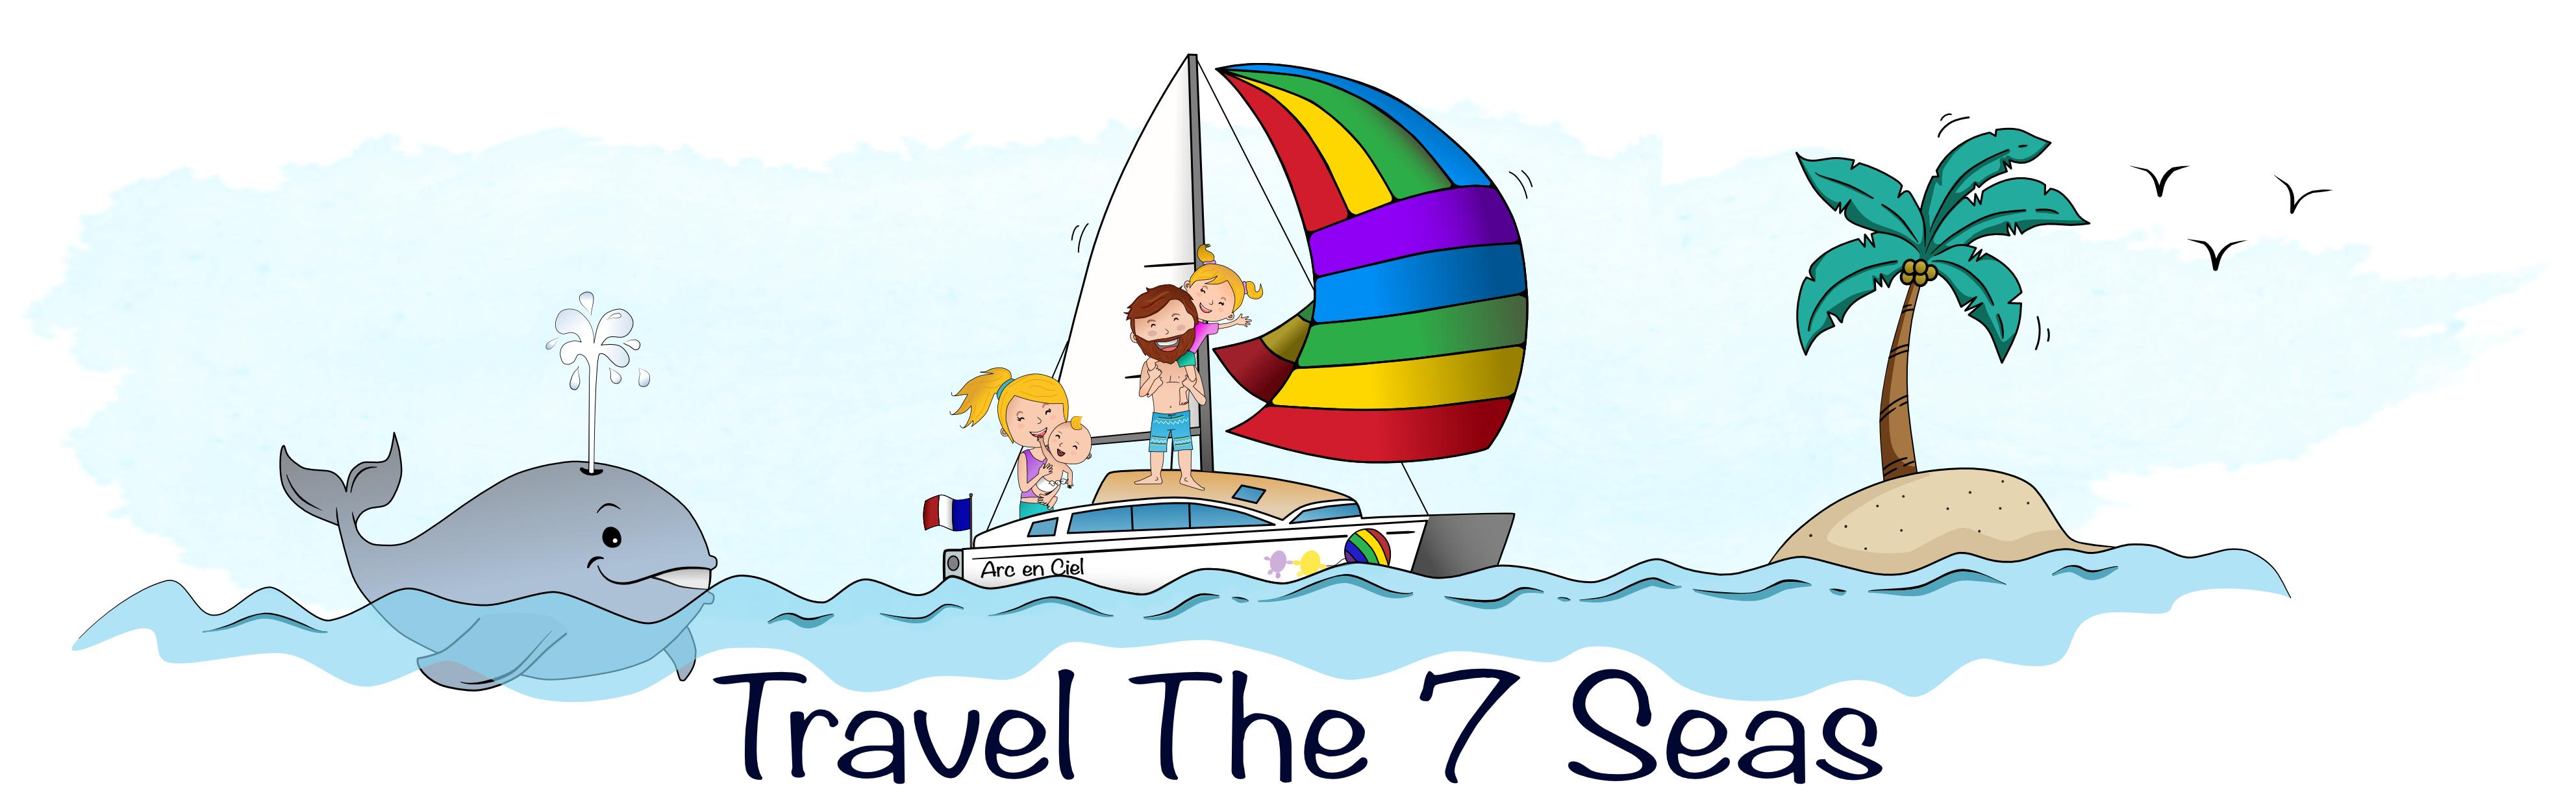 Travel The 7 Seas